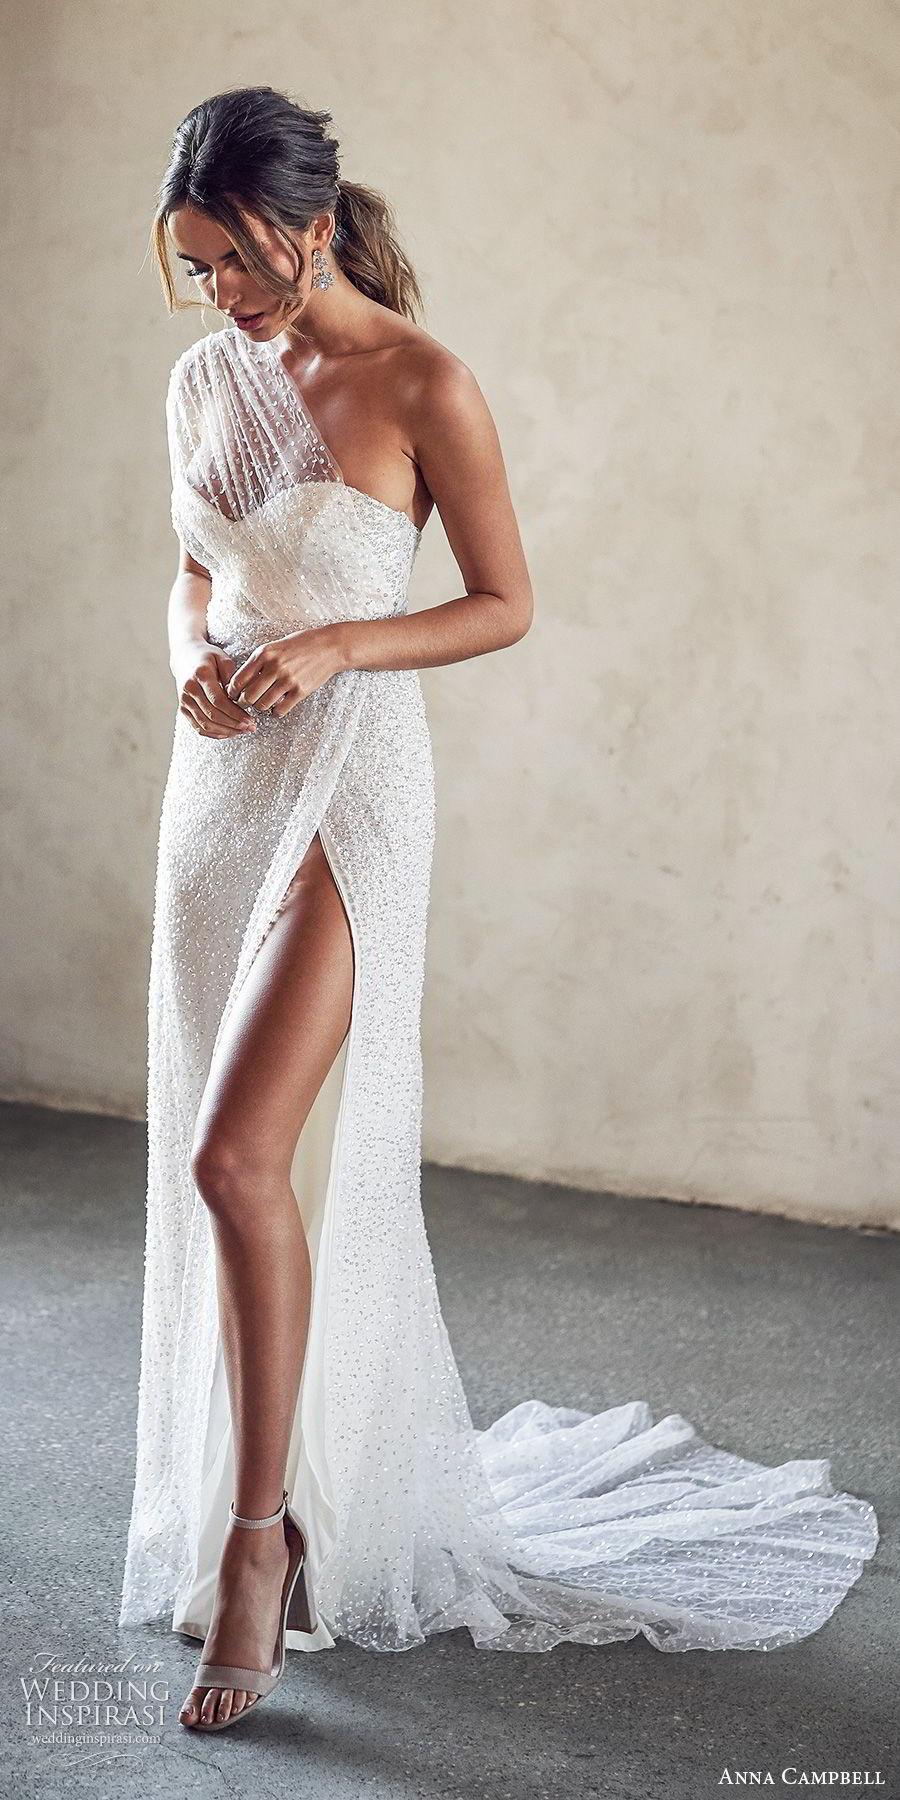 anna campbell 2020 bridal illusion one shoulder ruched bodice sweetheart fully embellished sheath wedding dress (13) slit skirt glitzy glam sexy chapel train mv